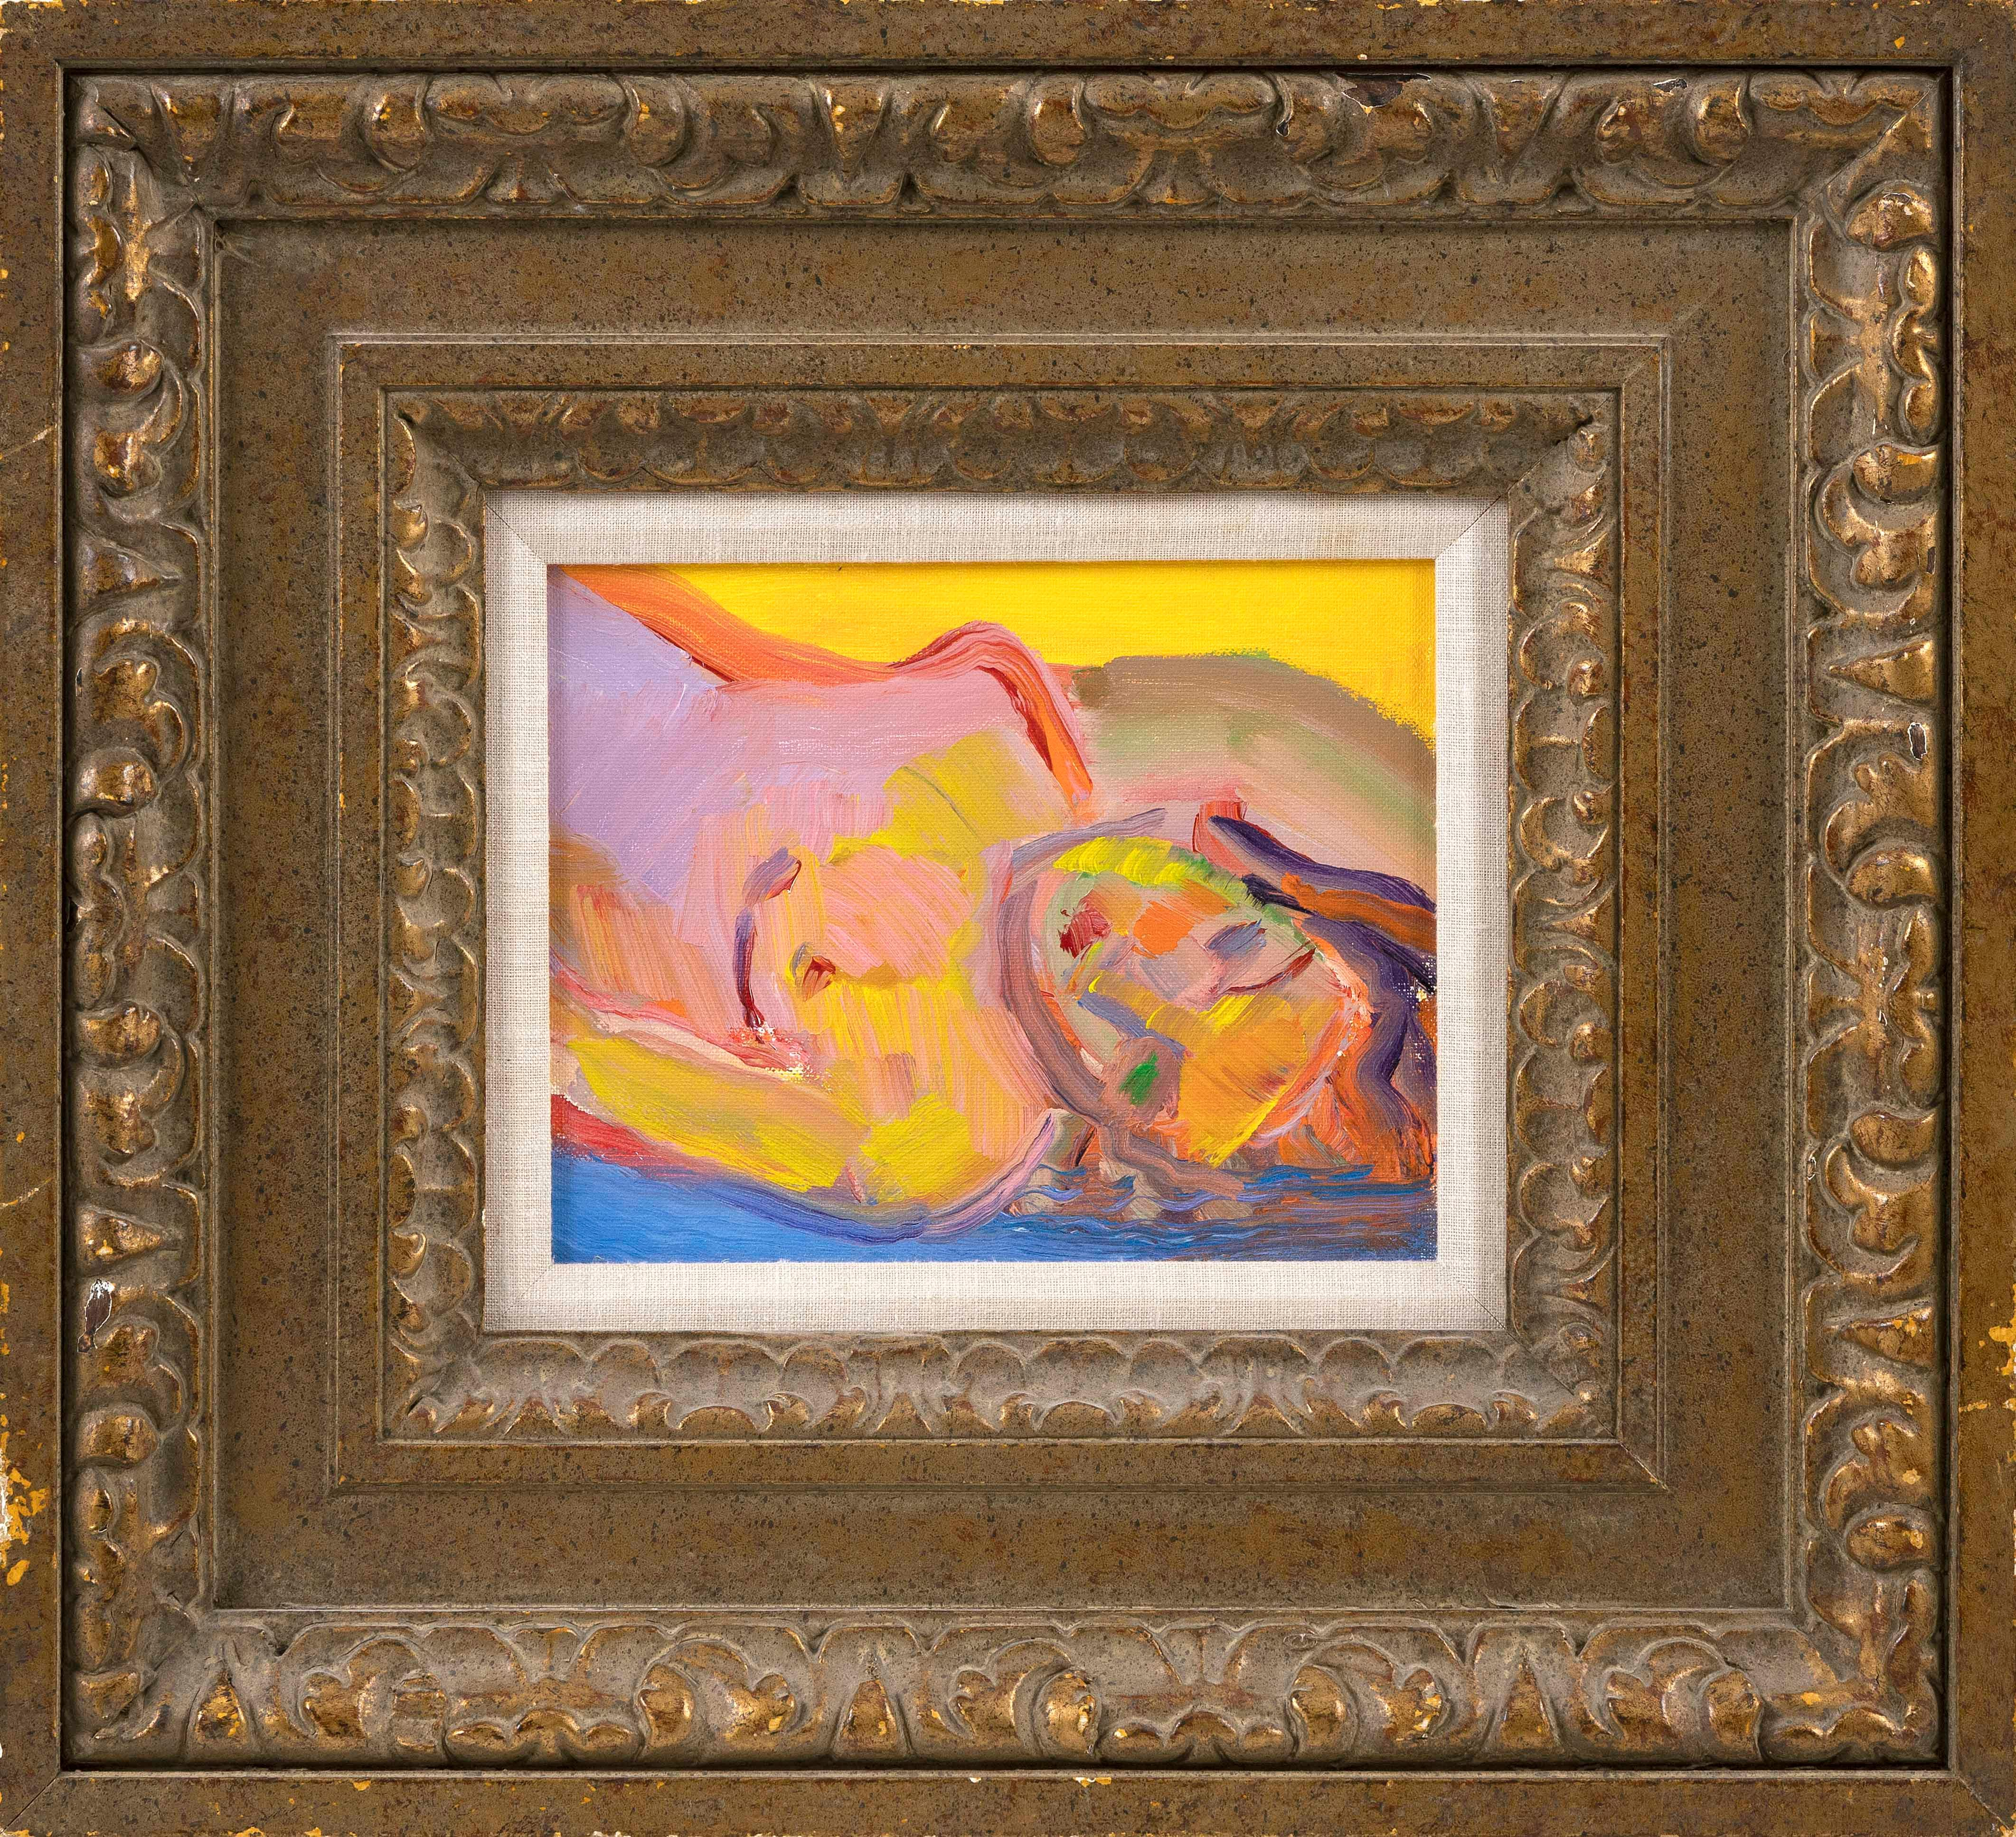 "JOHN GRILLO (Massachusetts, 1917-2014), Reclining nude., Oil on canvas, 8"" x 10"". Framed 19.5"" x 21.5""."